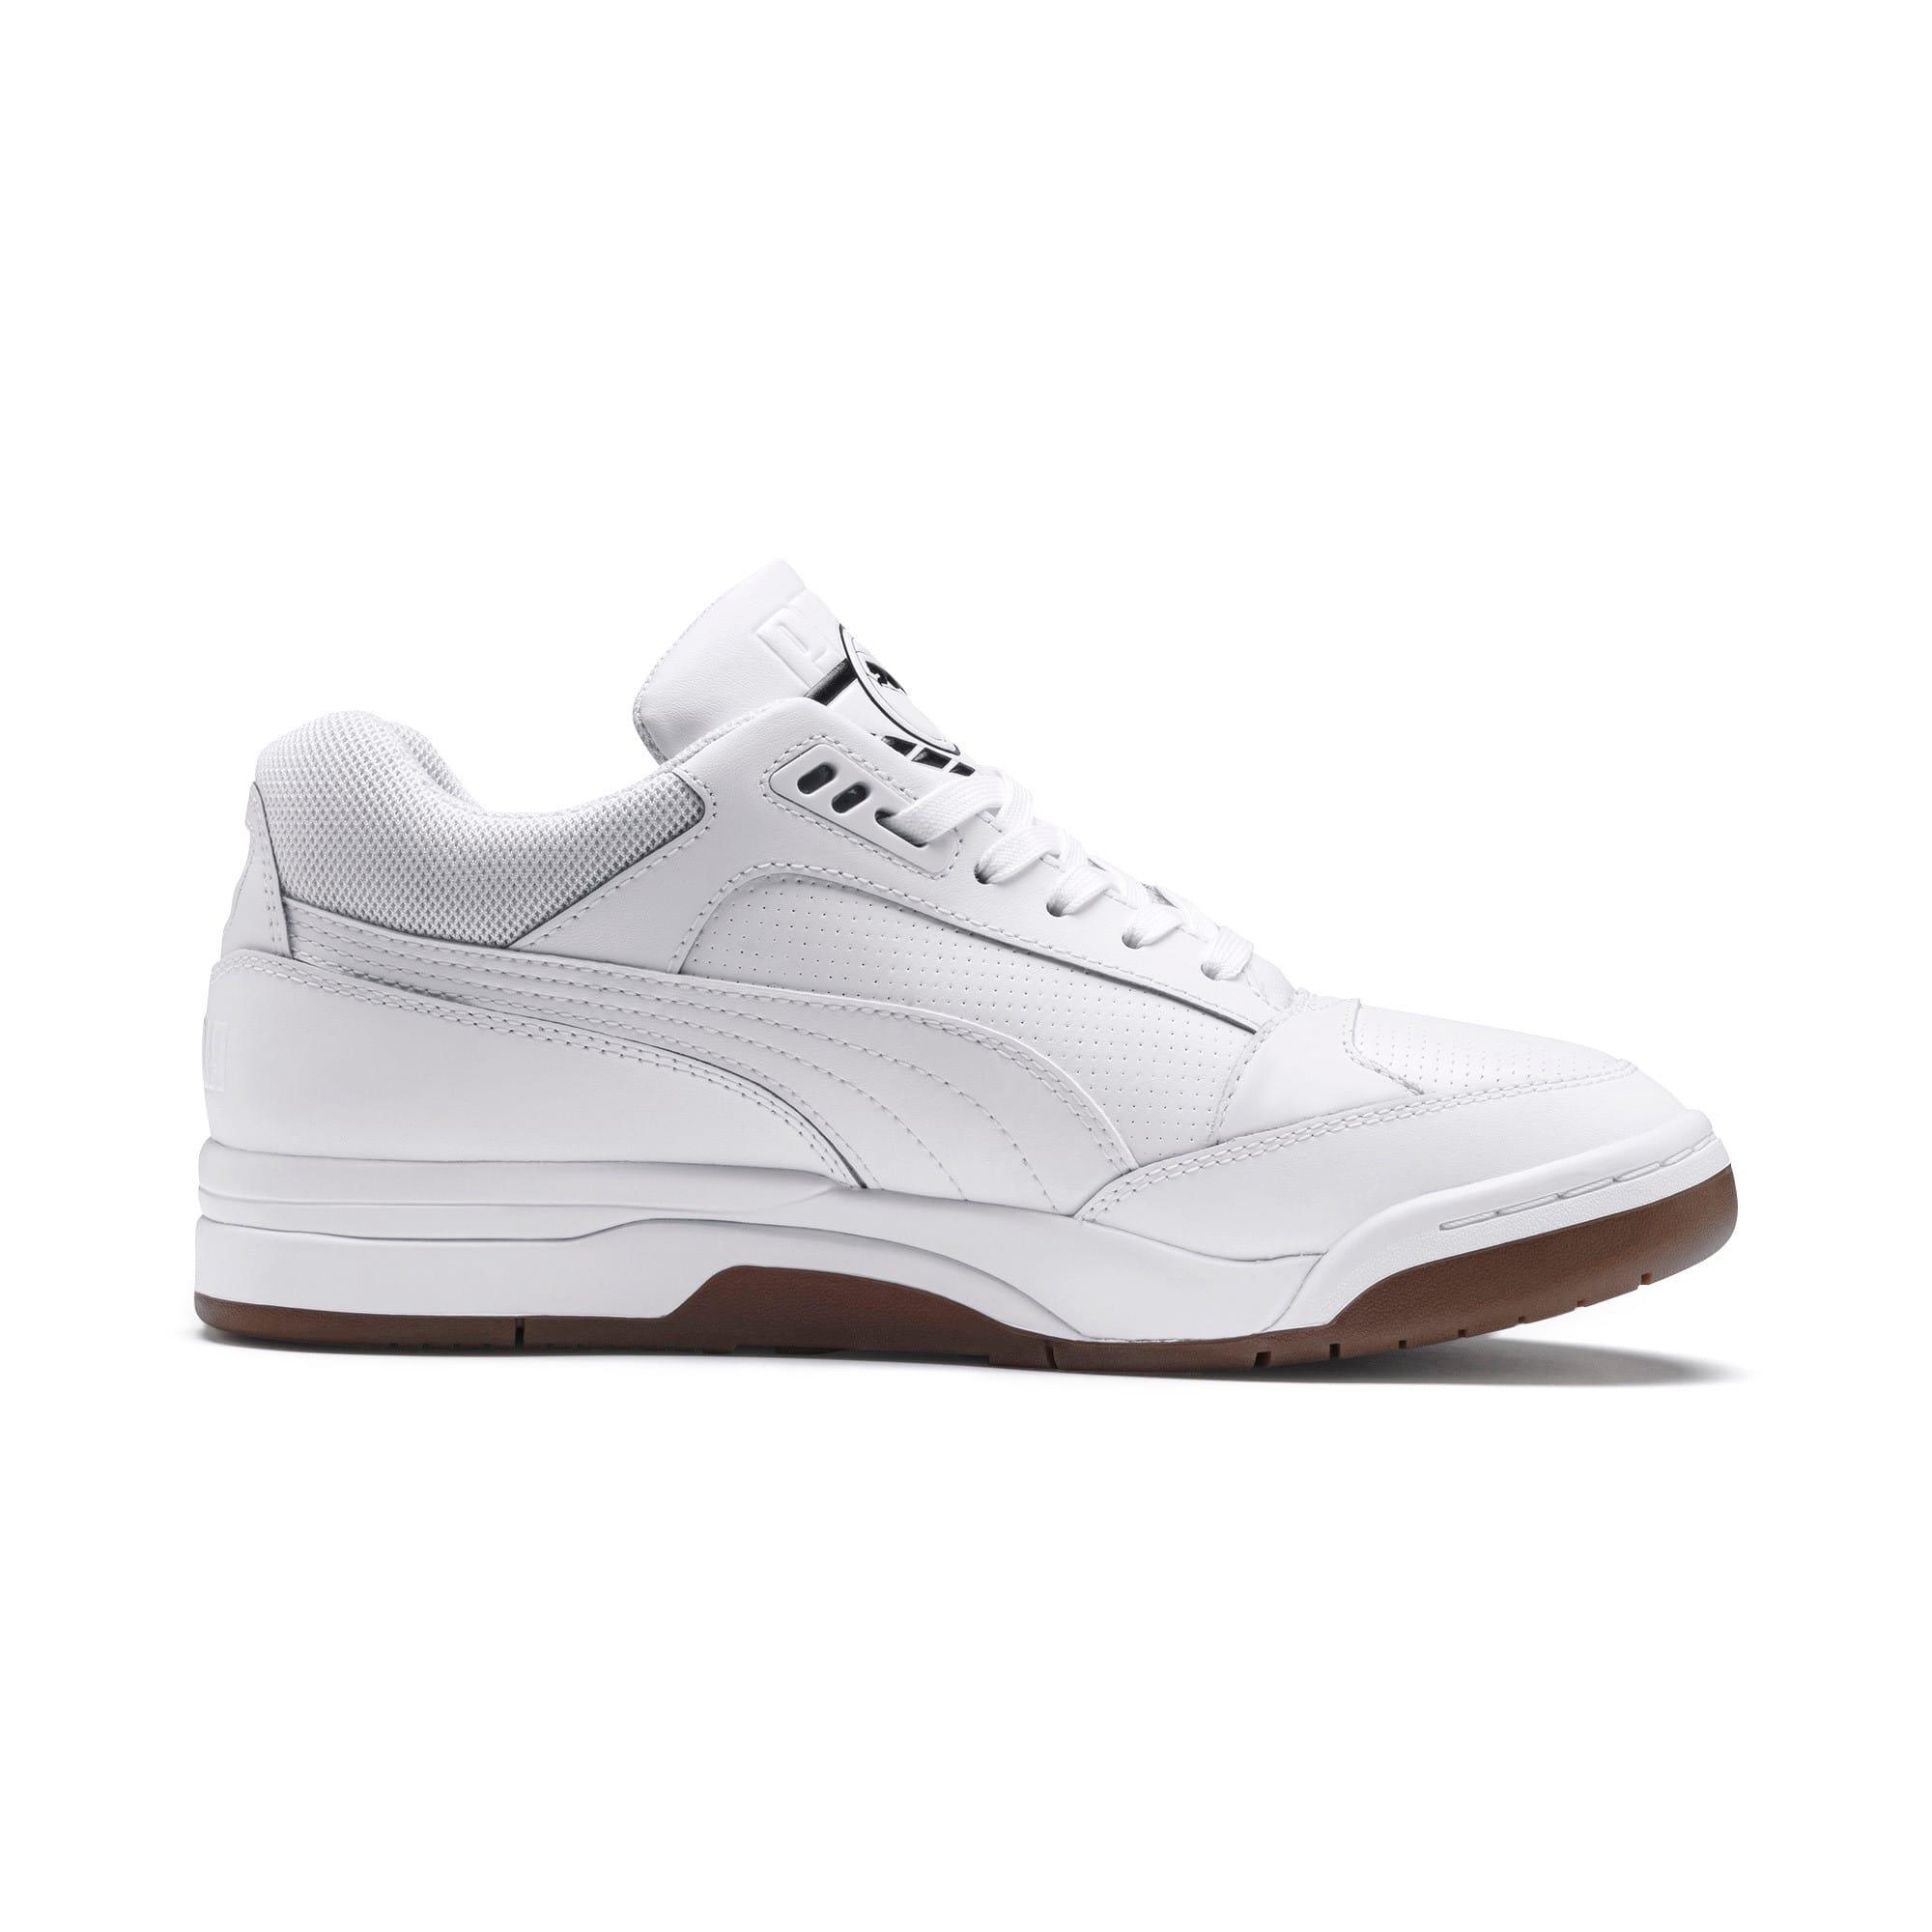 Thumbnail 5 of Palace Guard Sneakers, Puma White-Puma White-Gum, medium